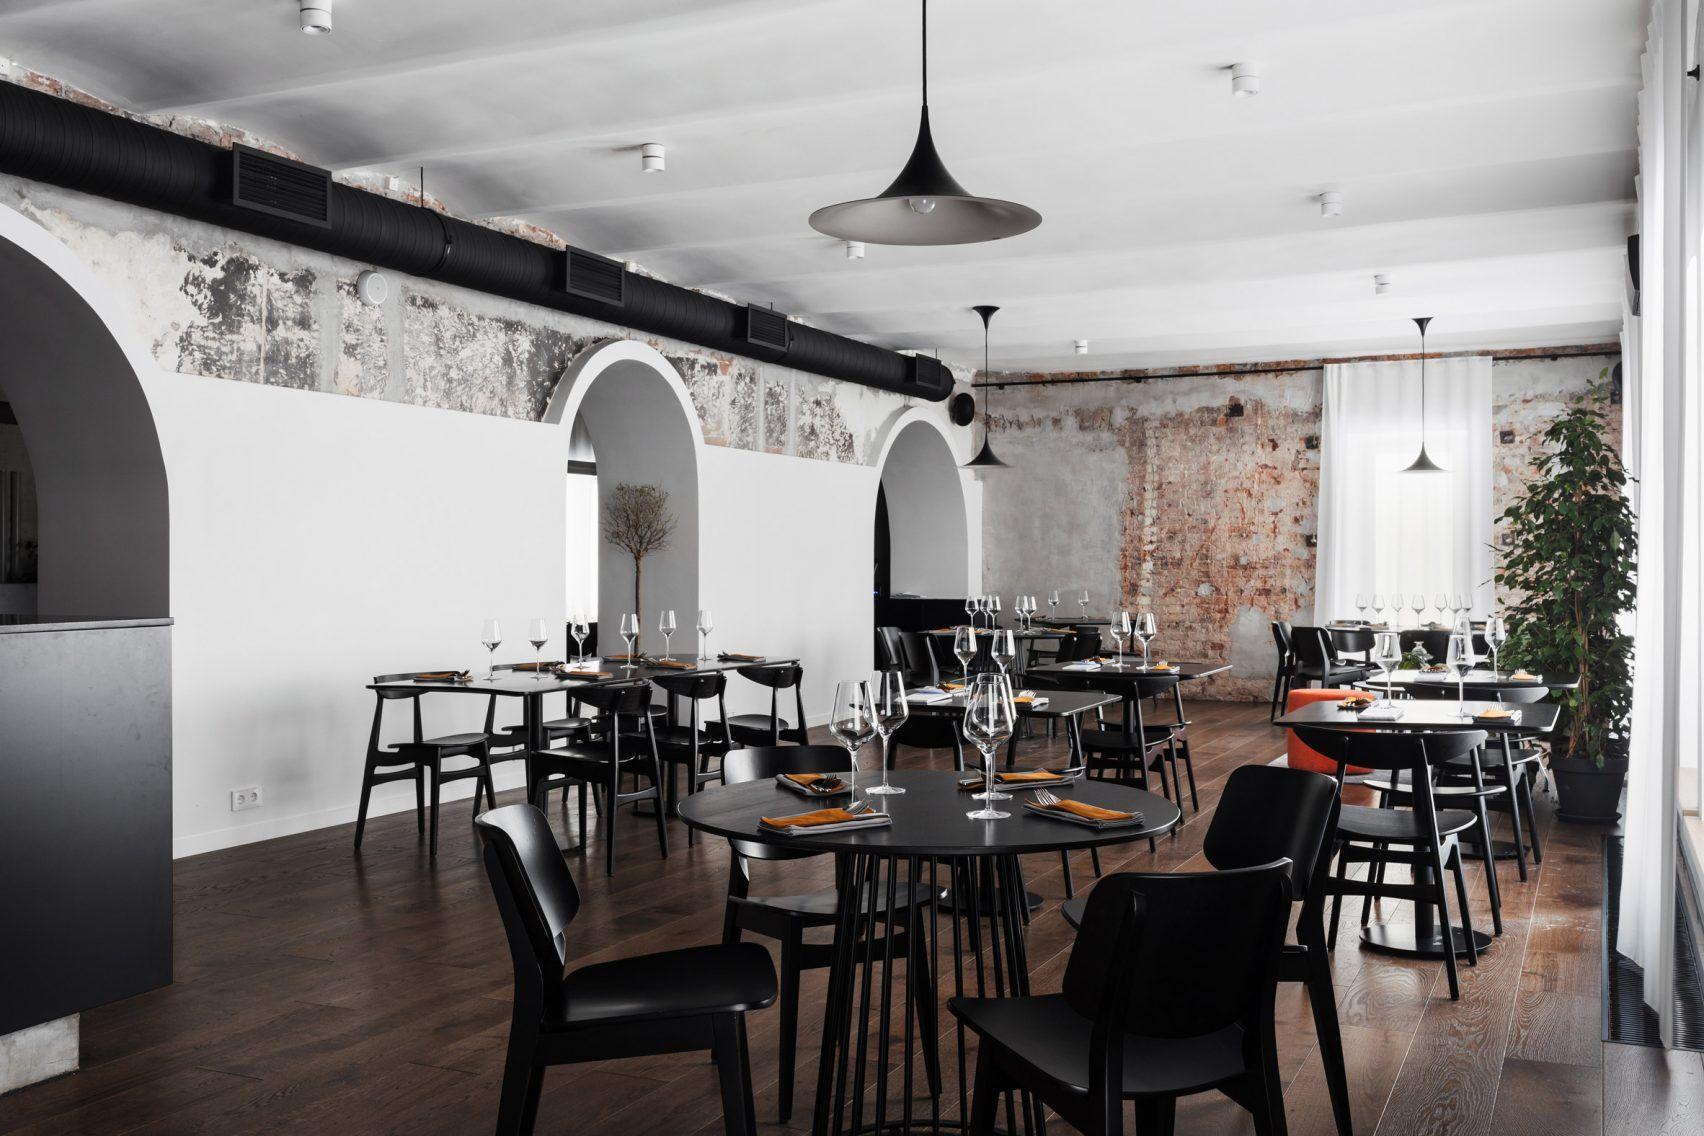 St Petersburg restaurant Gastrobar O pays tribute to